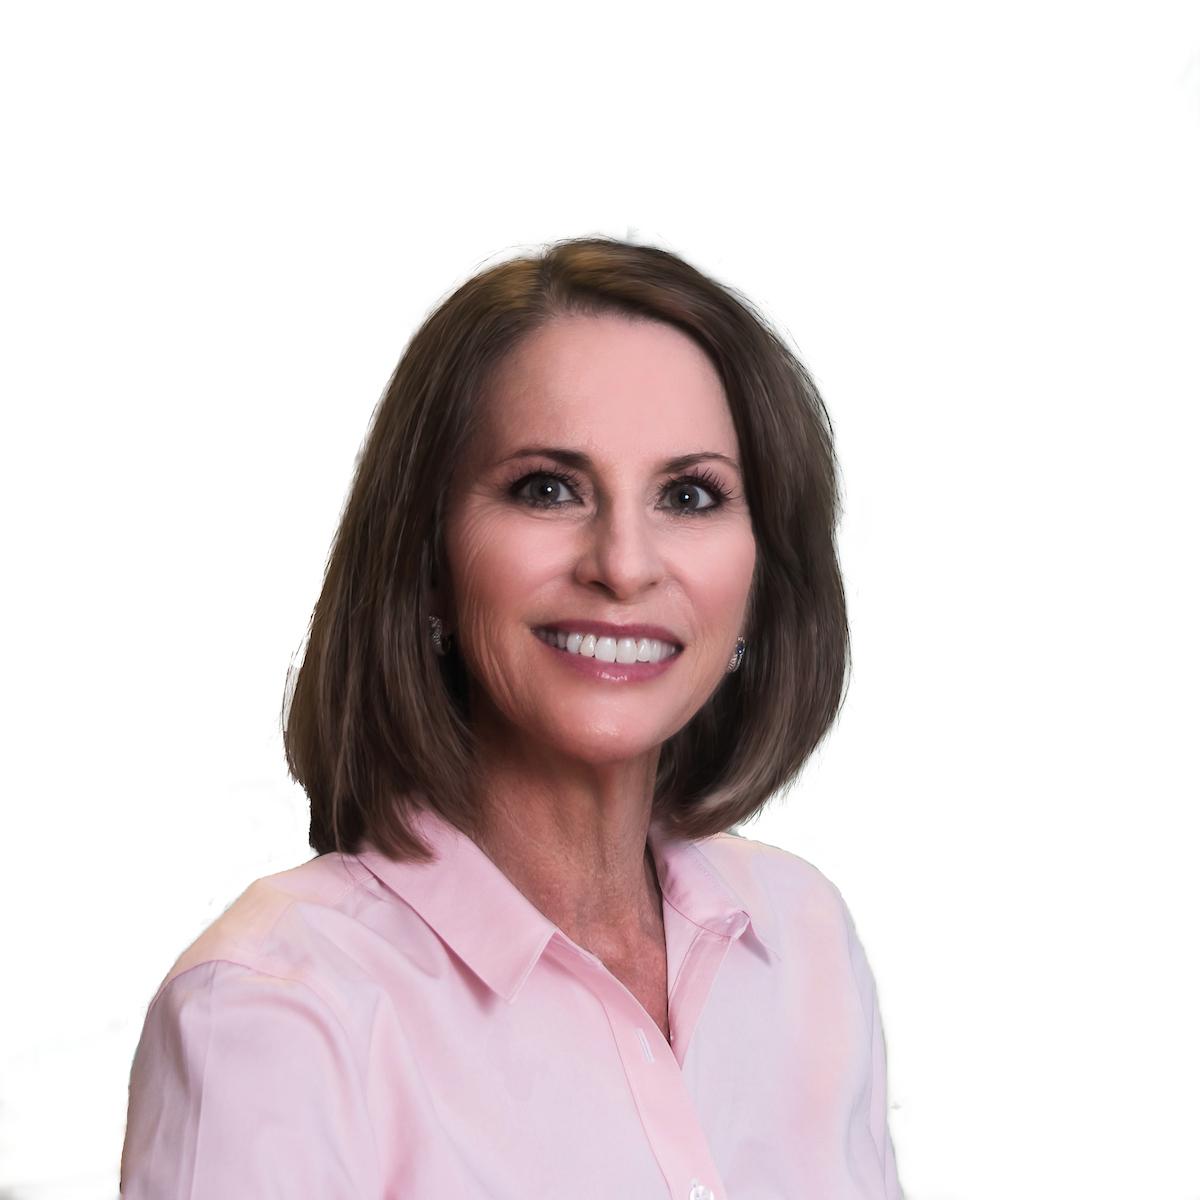 Gail ONeill, Pelvic Health Solutions